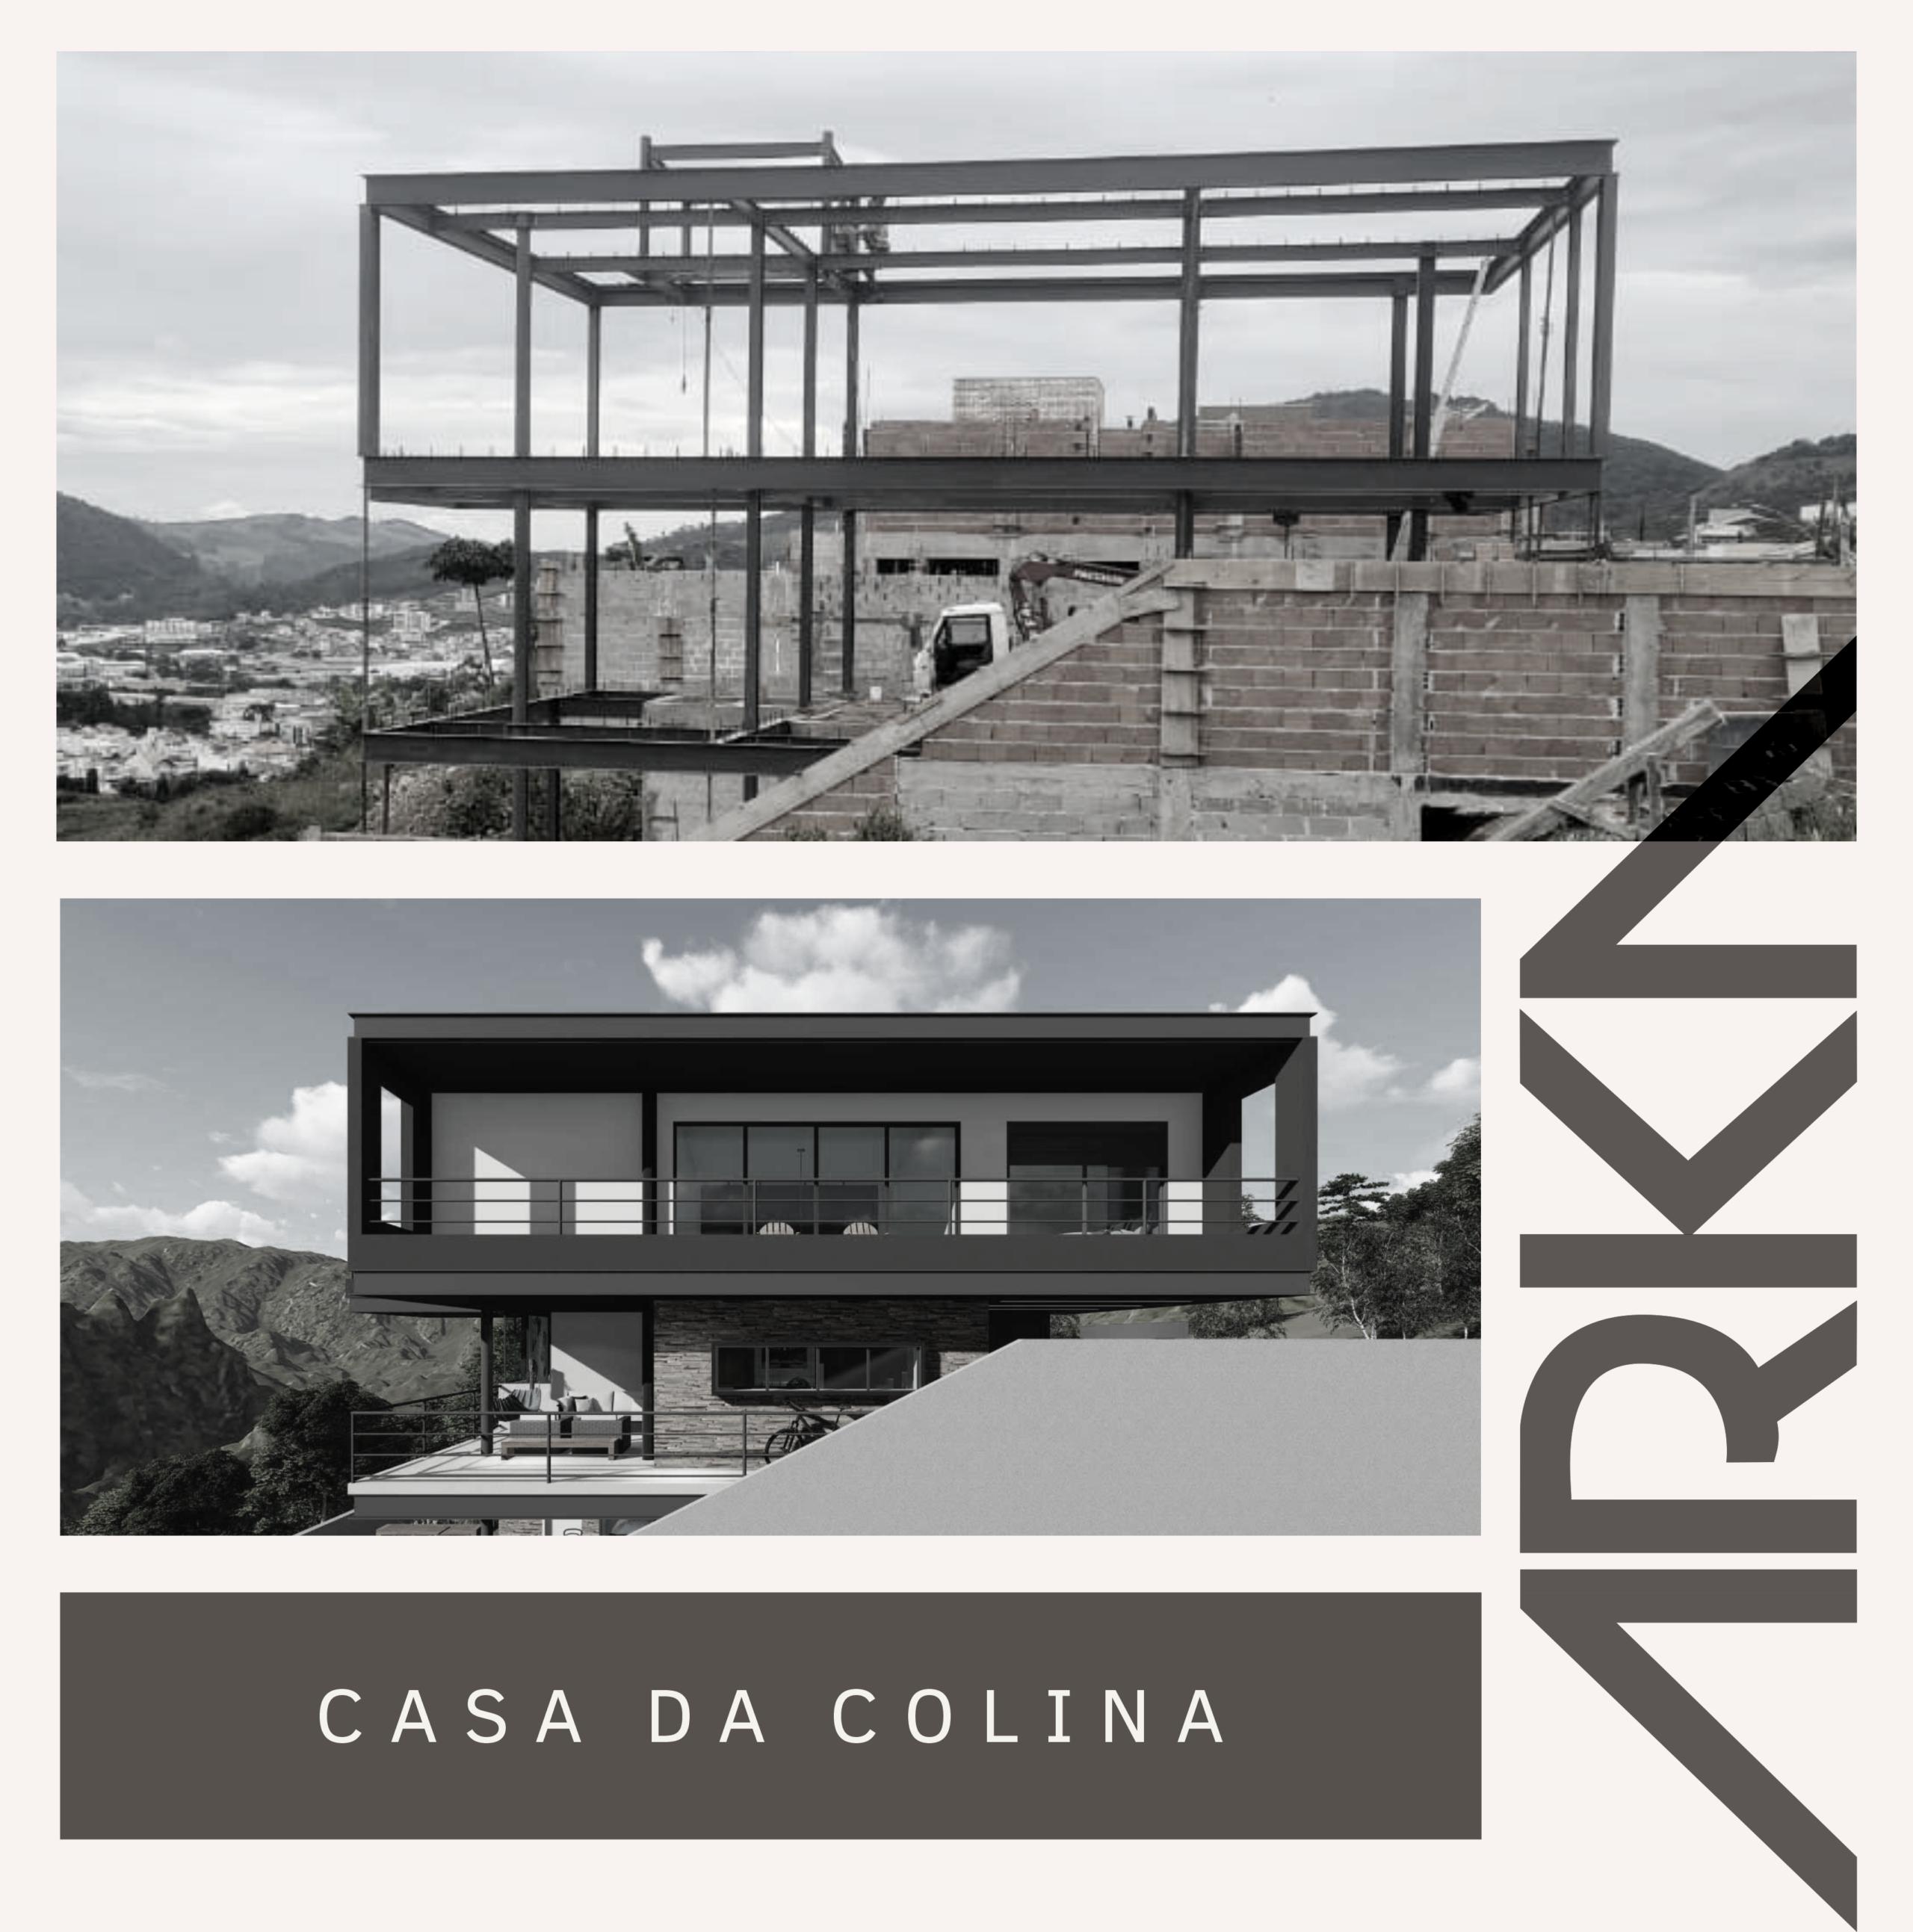 CASA DA COLINA